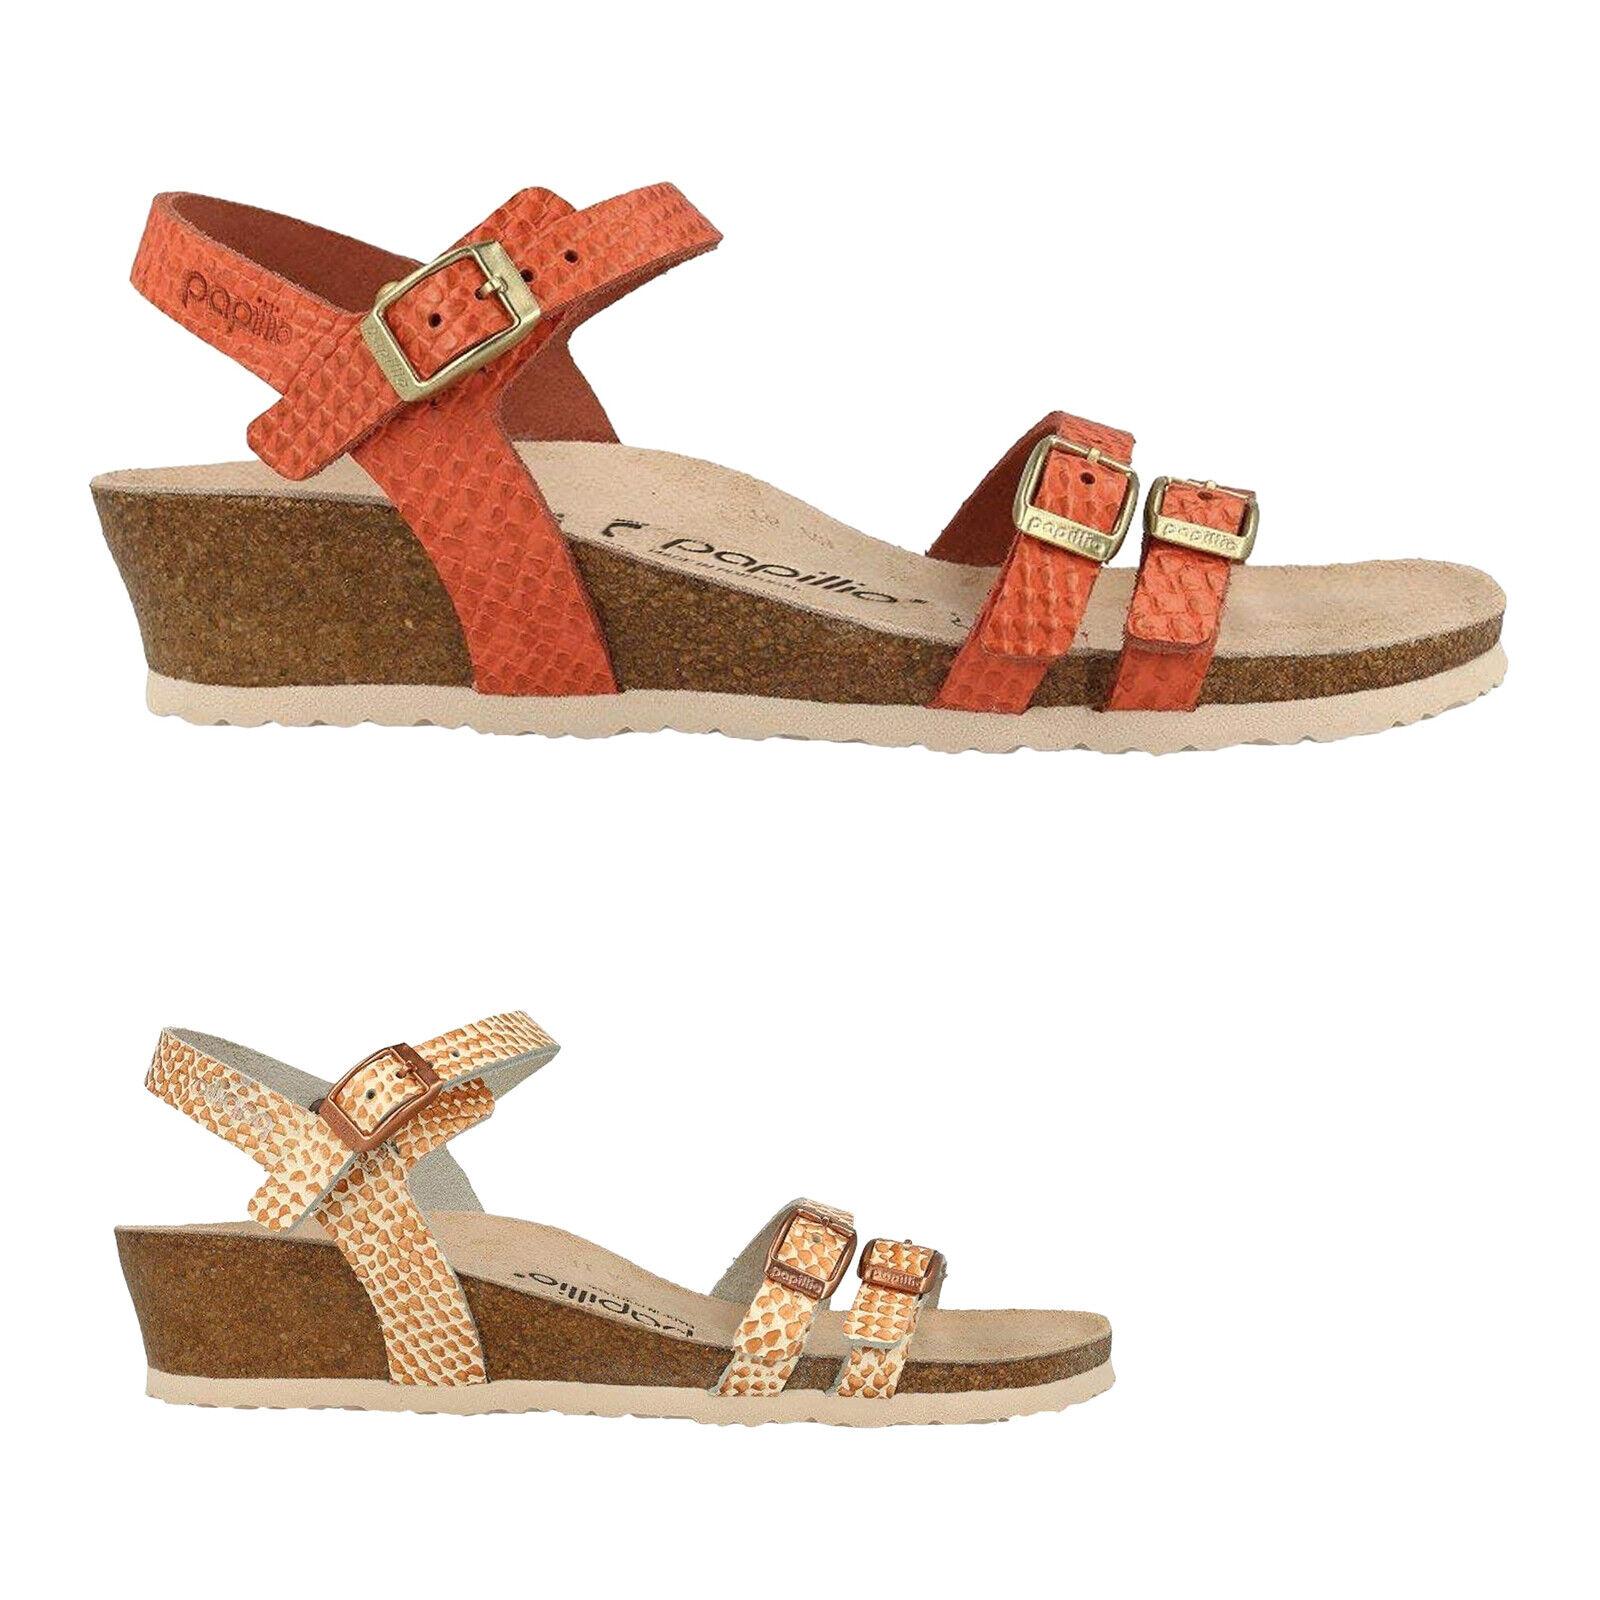 Papillio lana cuero casual floral botín-Strap wedge señora sandalias